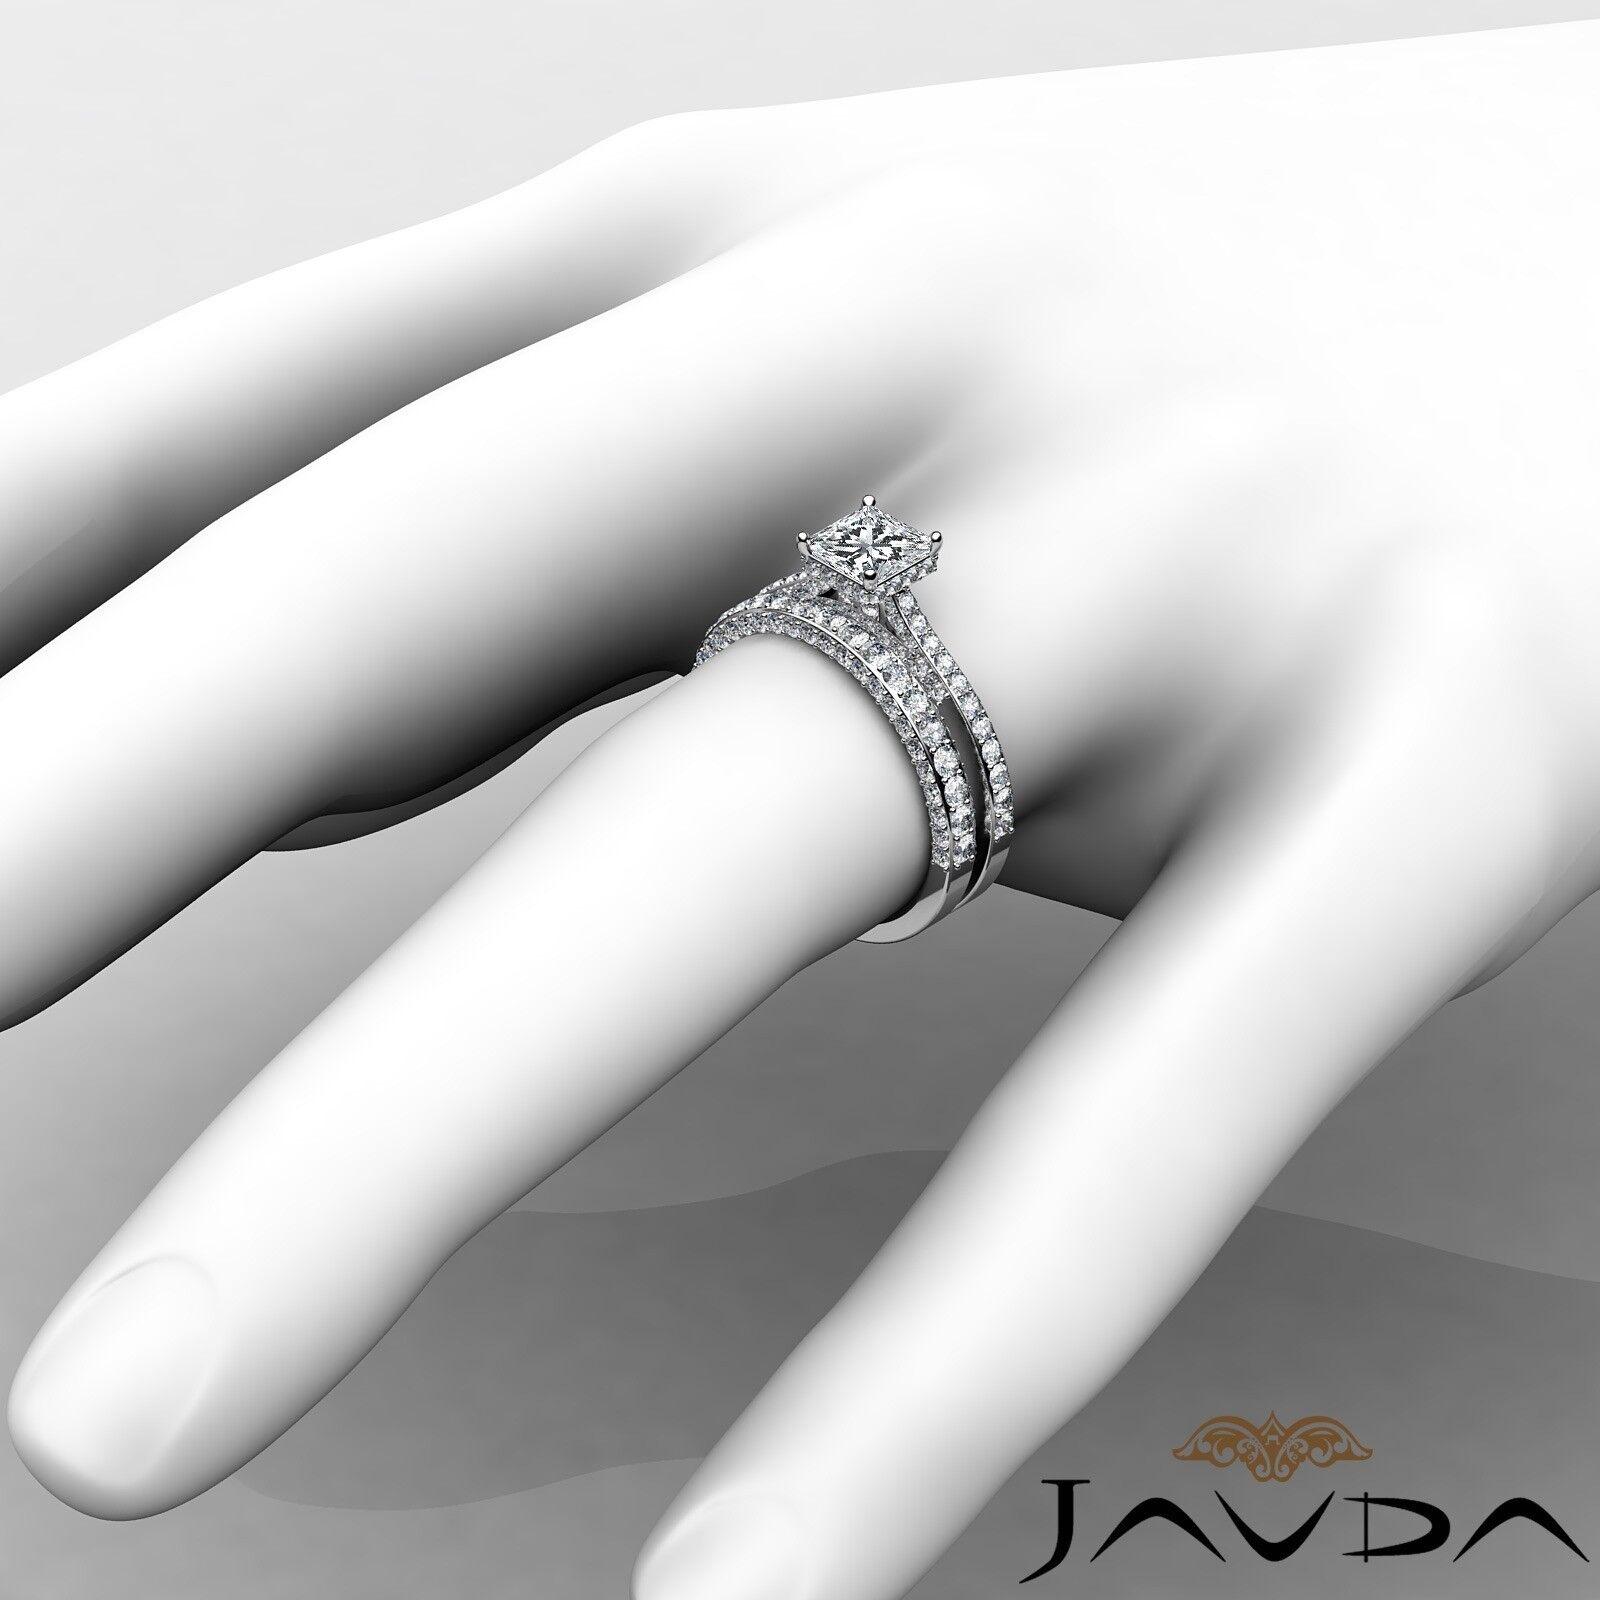 2.35ctw Circa Halo Pave Wedding Set Princess Diamond Engagement Ring GIA G-VVS1 4